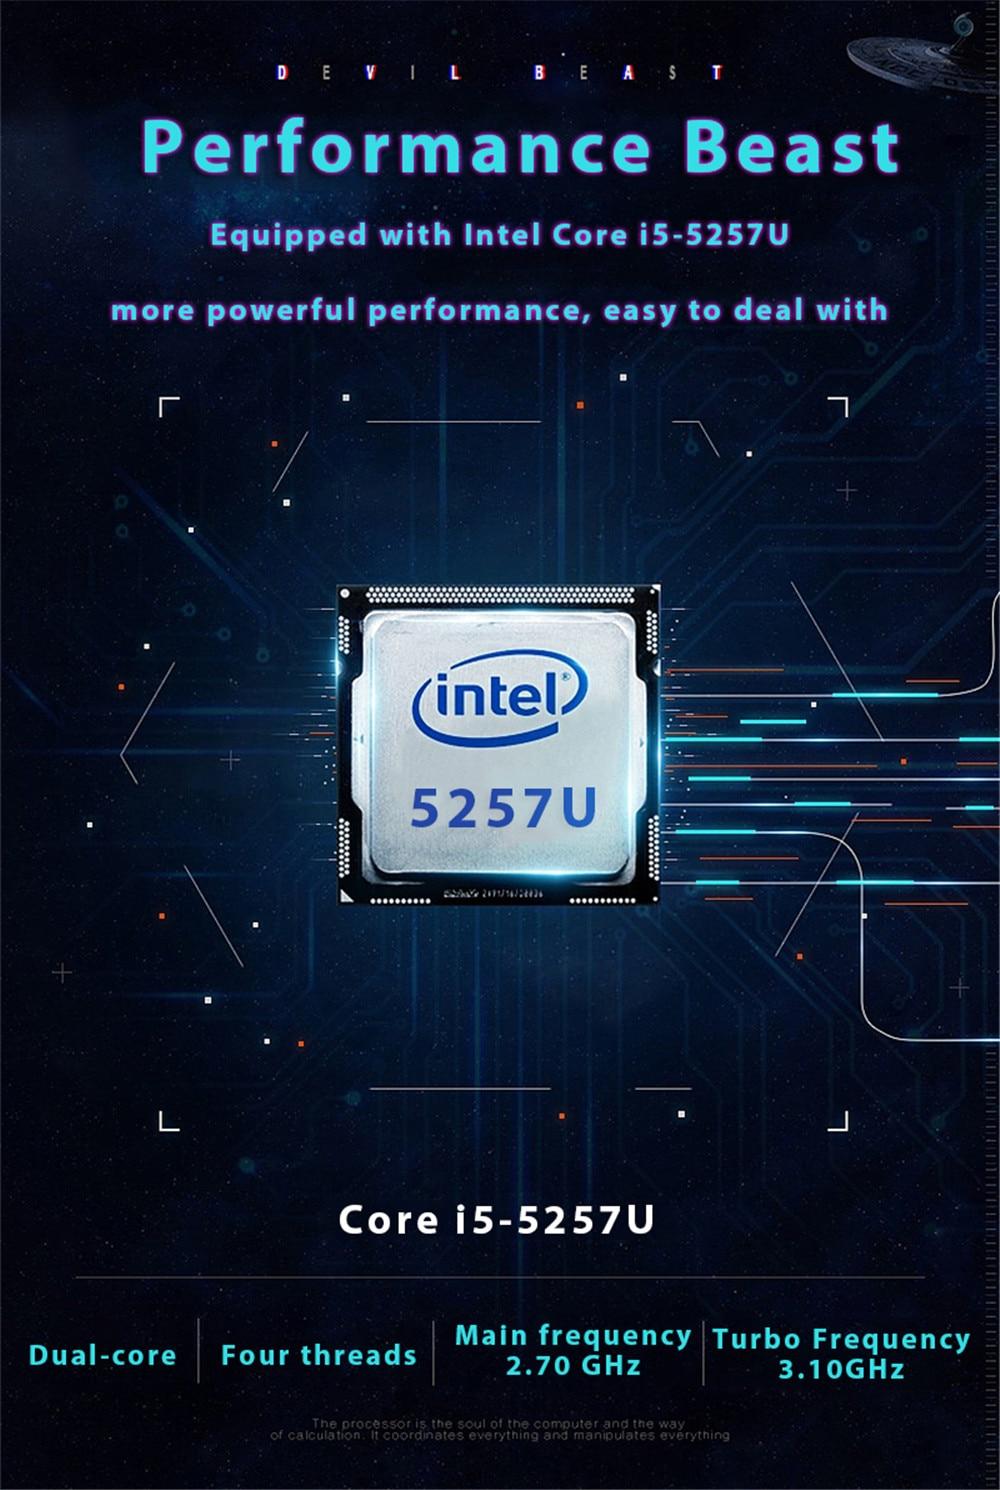 399609182929686528